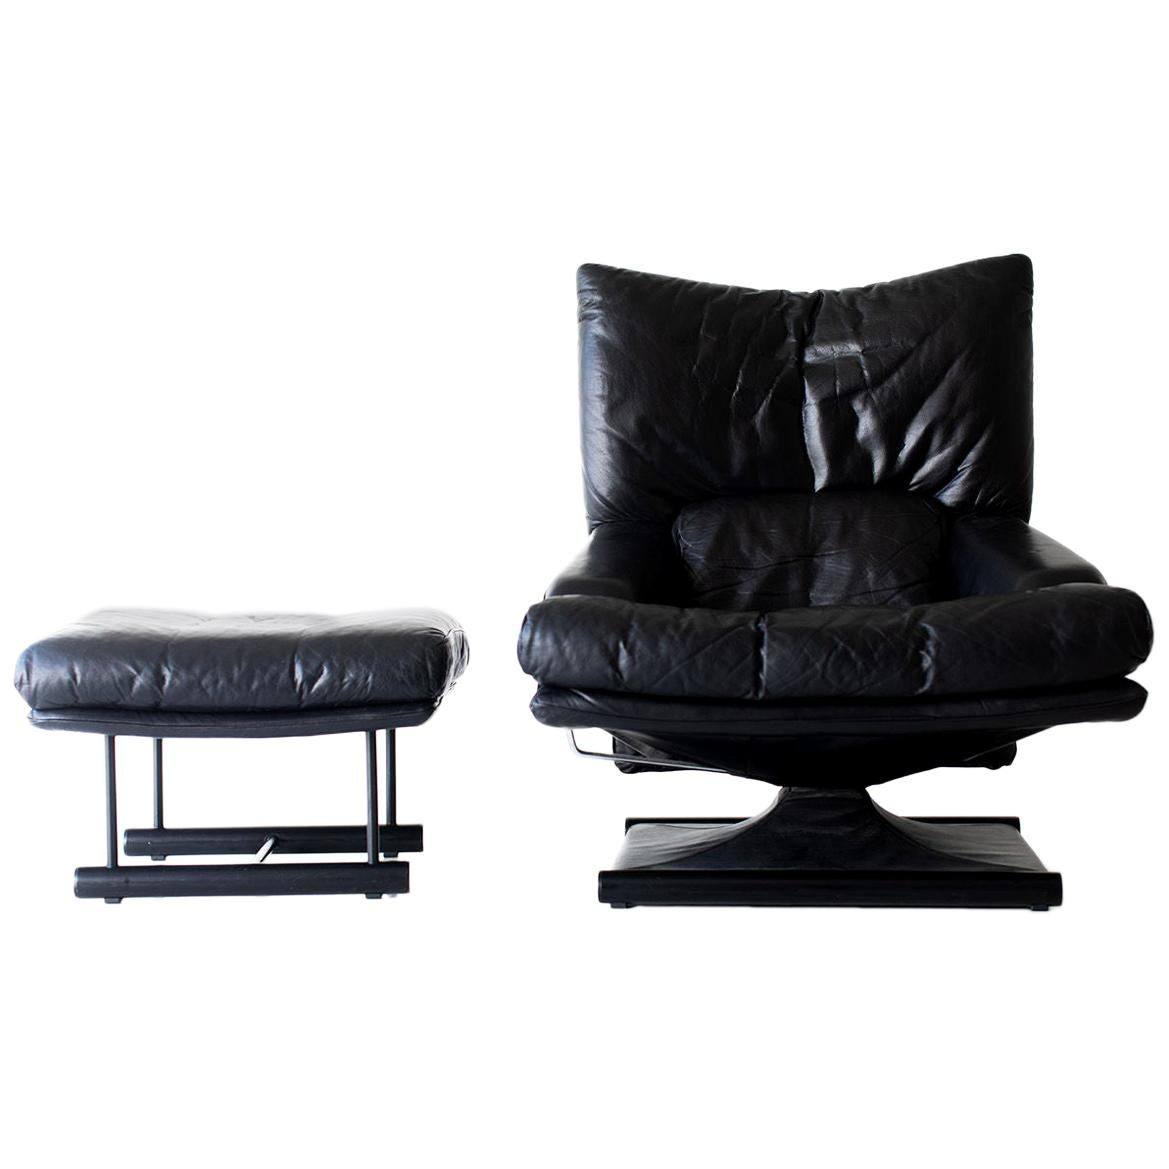 Mathias Hoffmann Lounge Chair and Ottoman for Rolf Benz